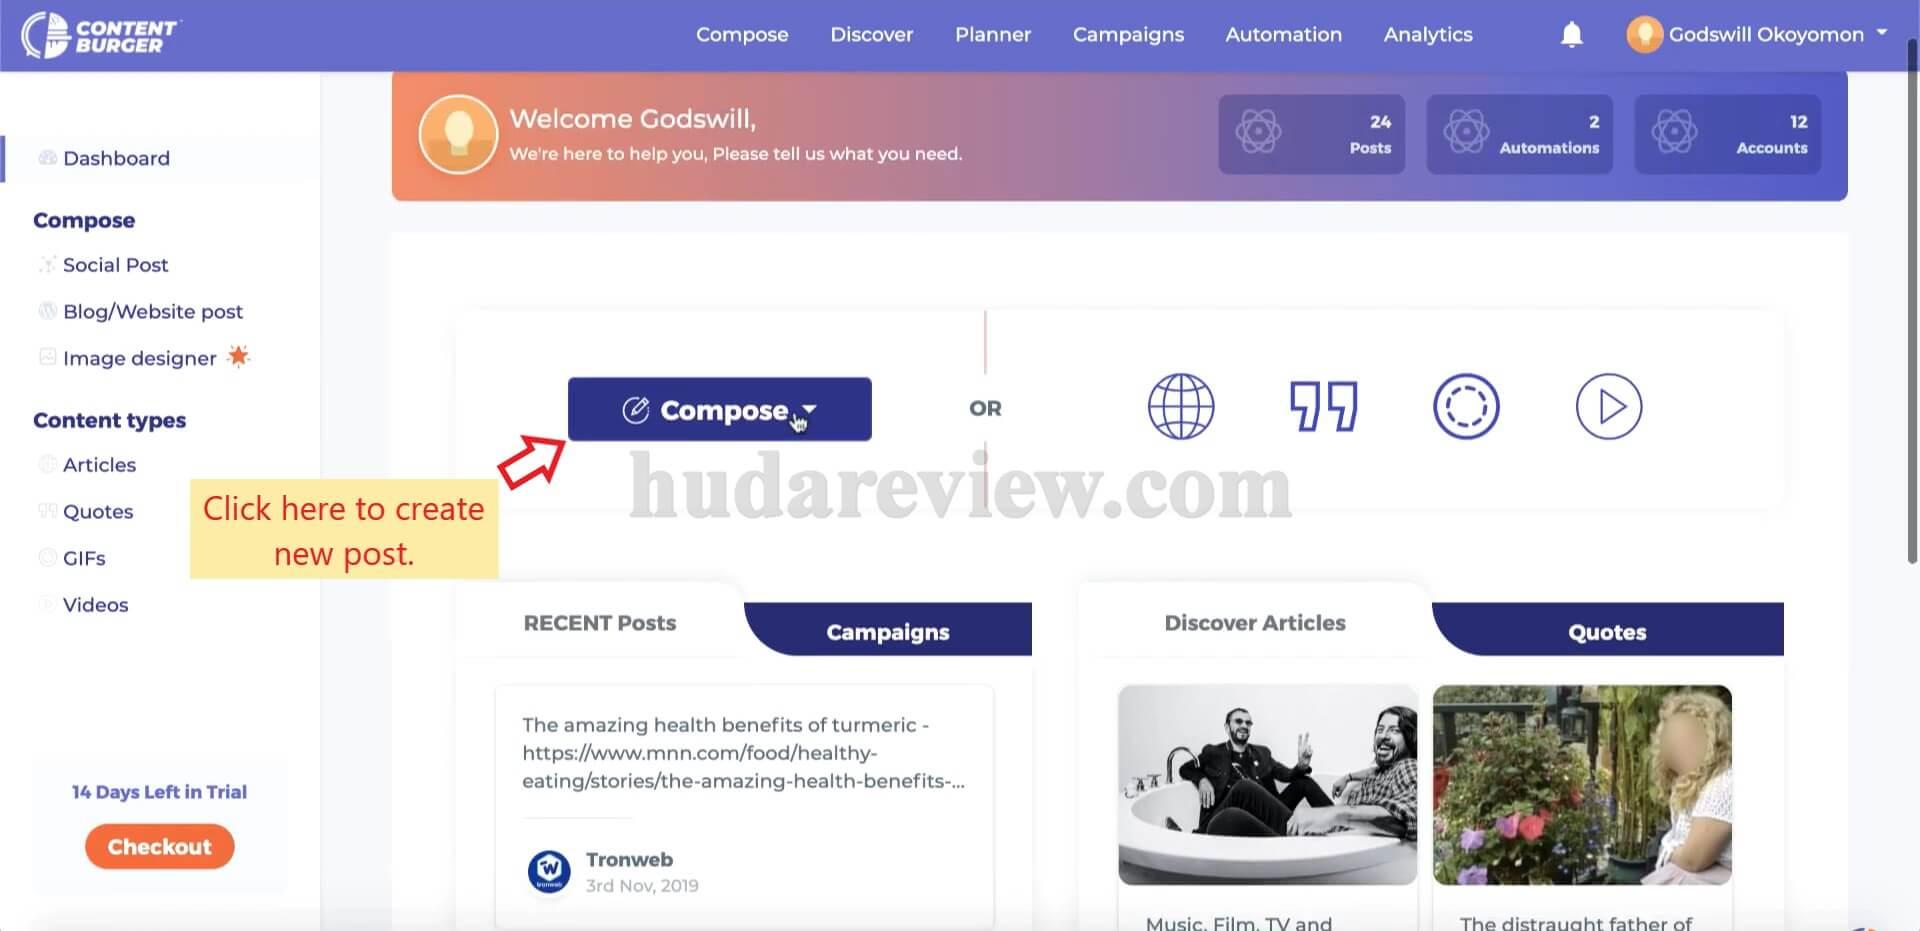 ContentBurger-Step-2-1